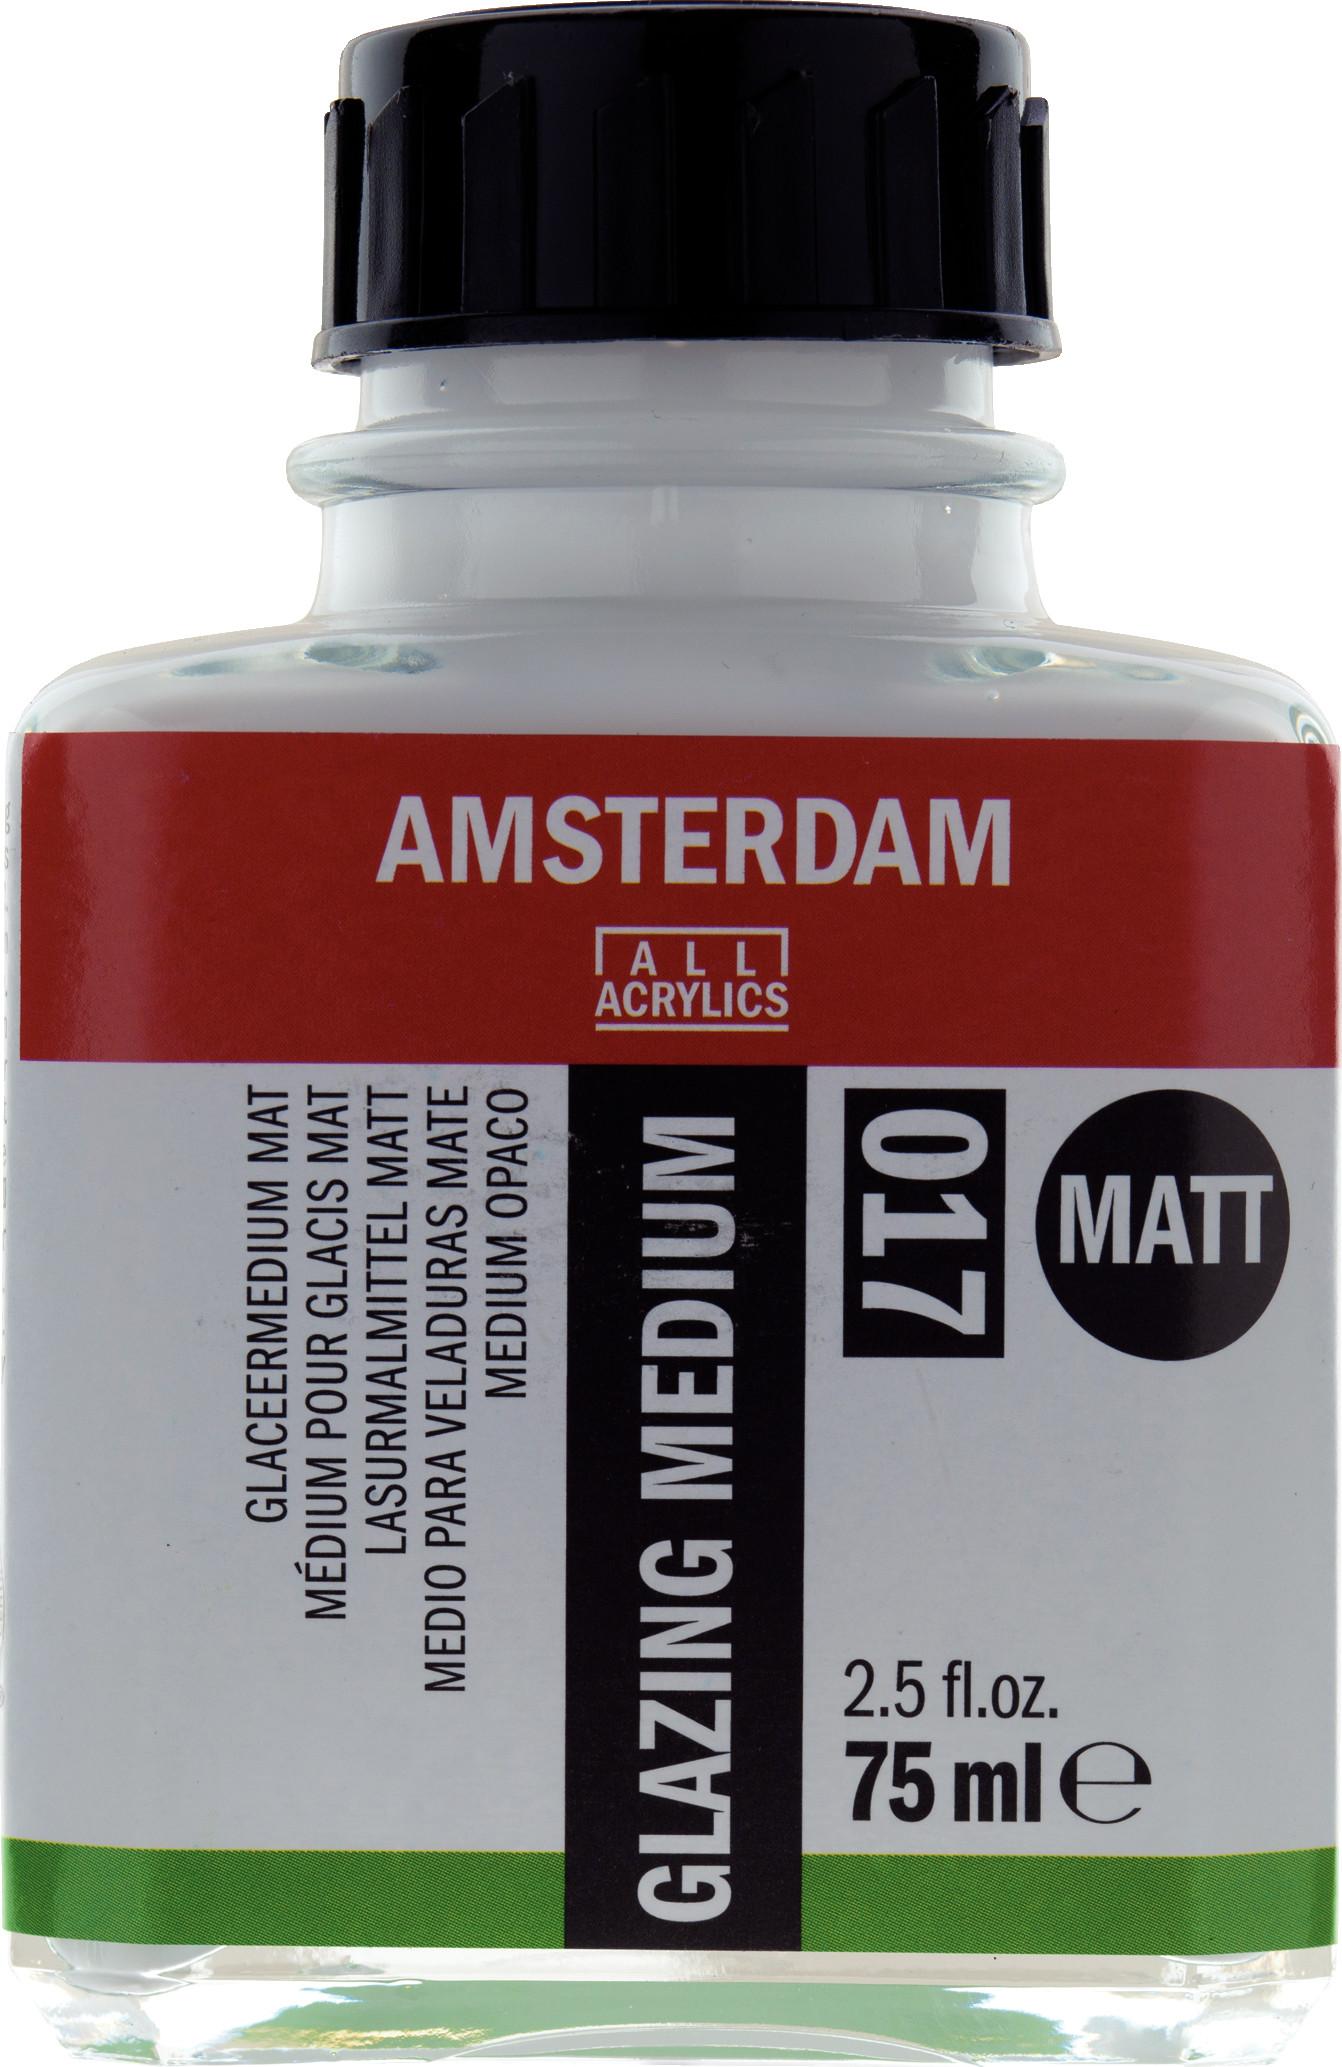 Amsterdam Glazing Medium Matt Bottle 75 ml